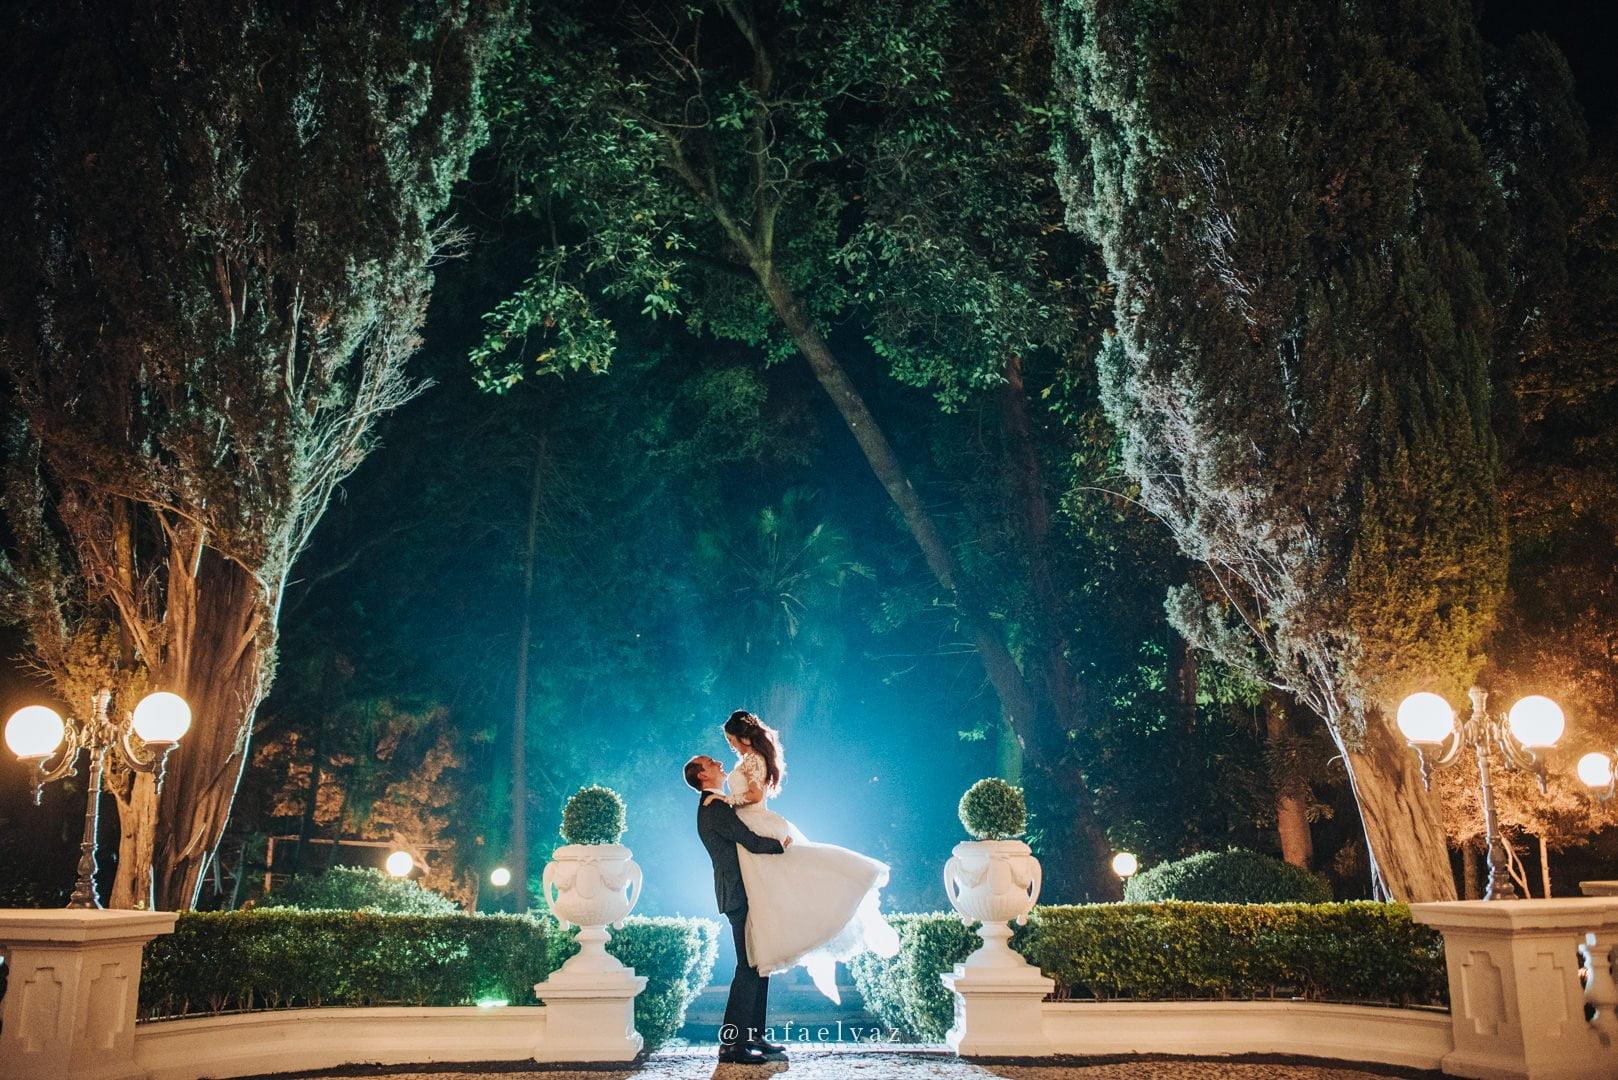 Palacio dos cedros, casamento no palacio dos cedros, casamento de dia no palacio dos cedros, casamento no gasebo palacios dos cedros, fotografo de casamento sp, palacio dos cedros decoracao, decoracao de casamento no palacio dos cedros, fotografo de casamento palacio dos cedros, rafael vaz no palacio dos cedros, rafael vaz fotografo, rafael vaz fotografia